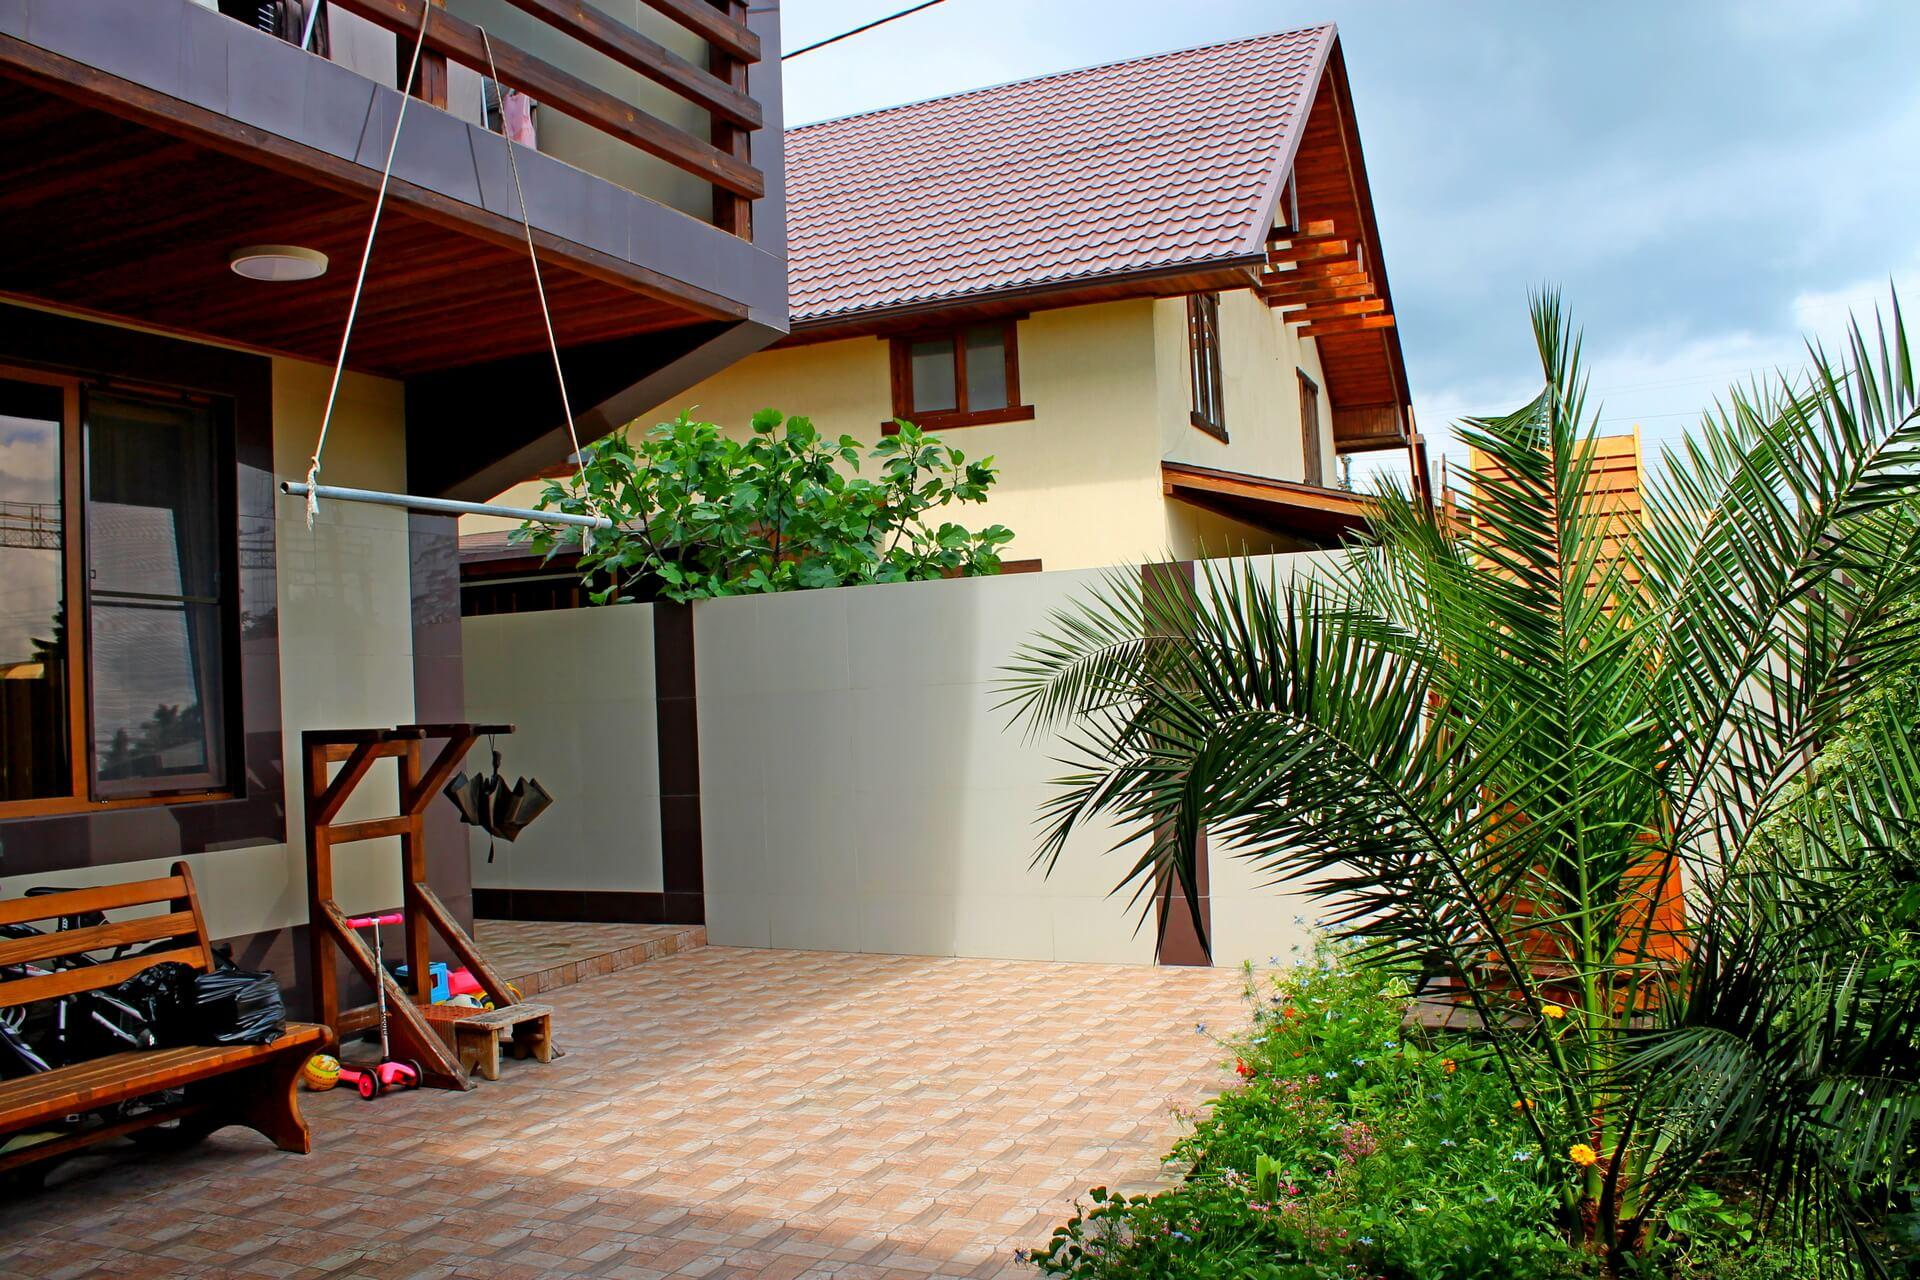 Гостевой дом на улице Веселая - image Gostevoj-dom-v-Adlere-3 on http://bizneskvartal.ru